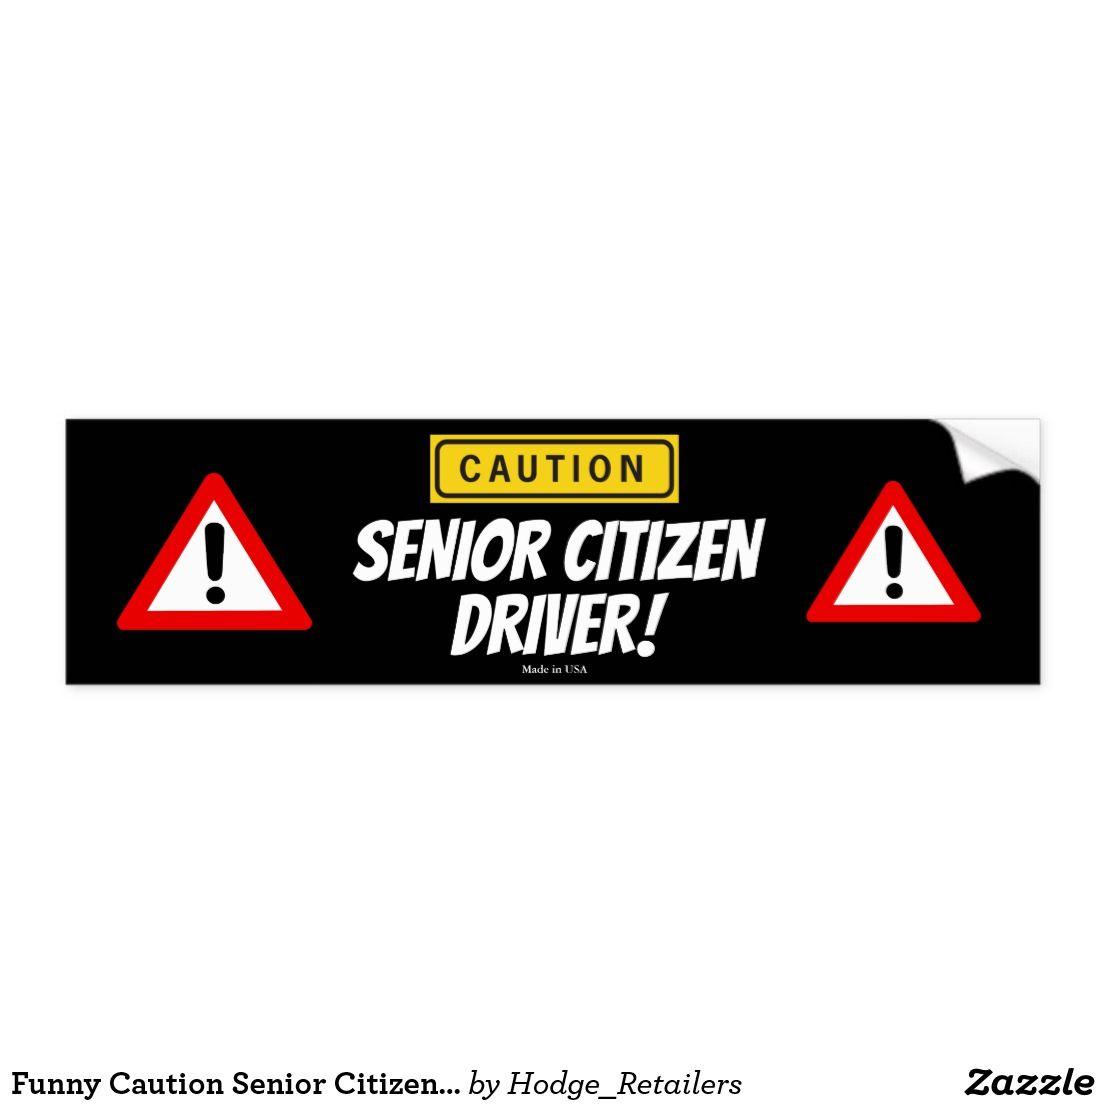 Funny Caution Senior Citizen Driver Bumper Sticker Zazzle Com Bumper Stickers Funny Bumper Stickers Bumpers [ 1106 x 1106 Pixel ]